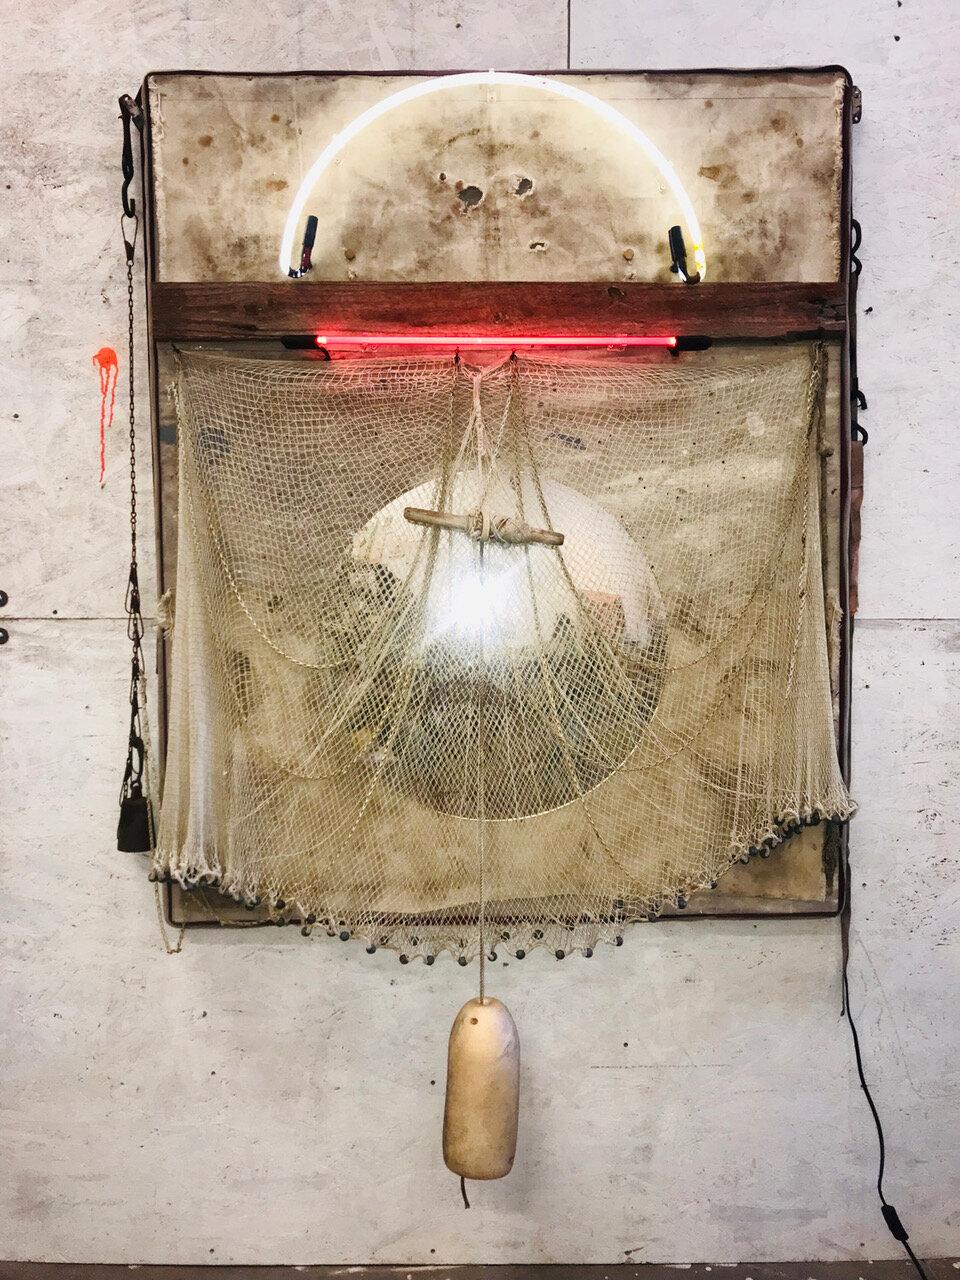 Dreams River_2019_WEB_76x53x7_morror fabric neon metal rope twin lead wood foam on panel.jpeg